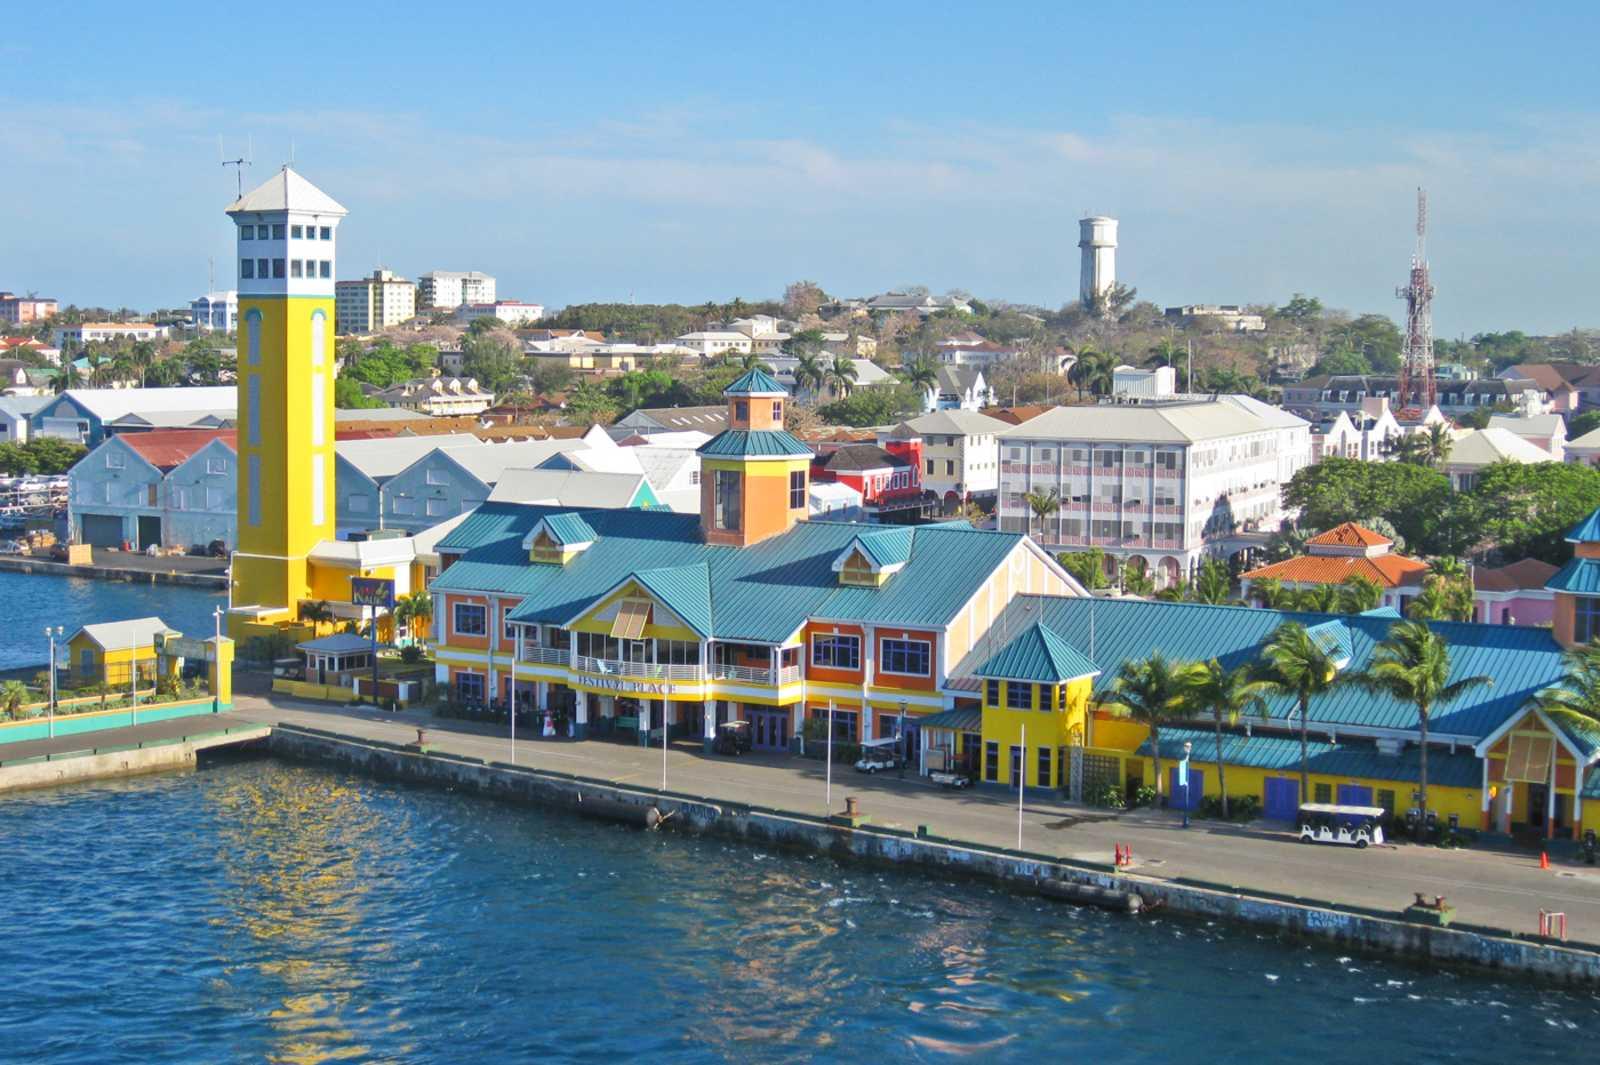 Nassau, die Hauptstadt der Bahamas